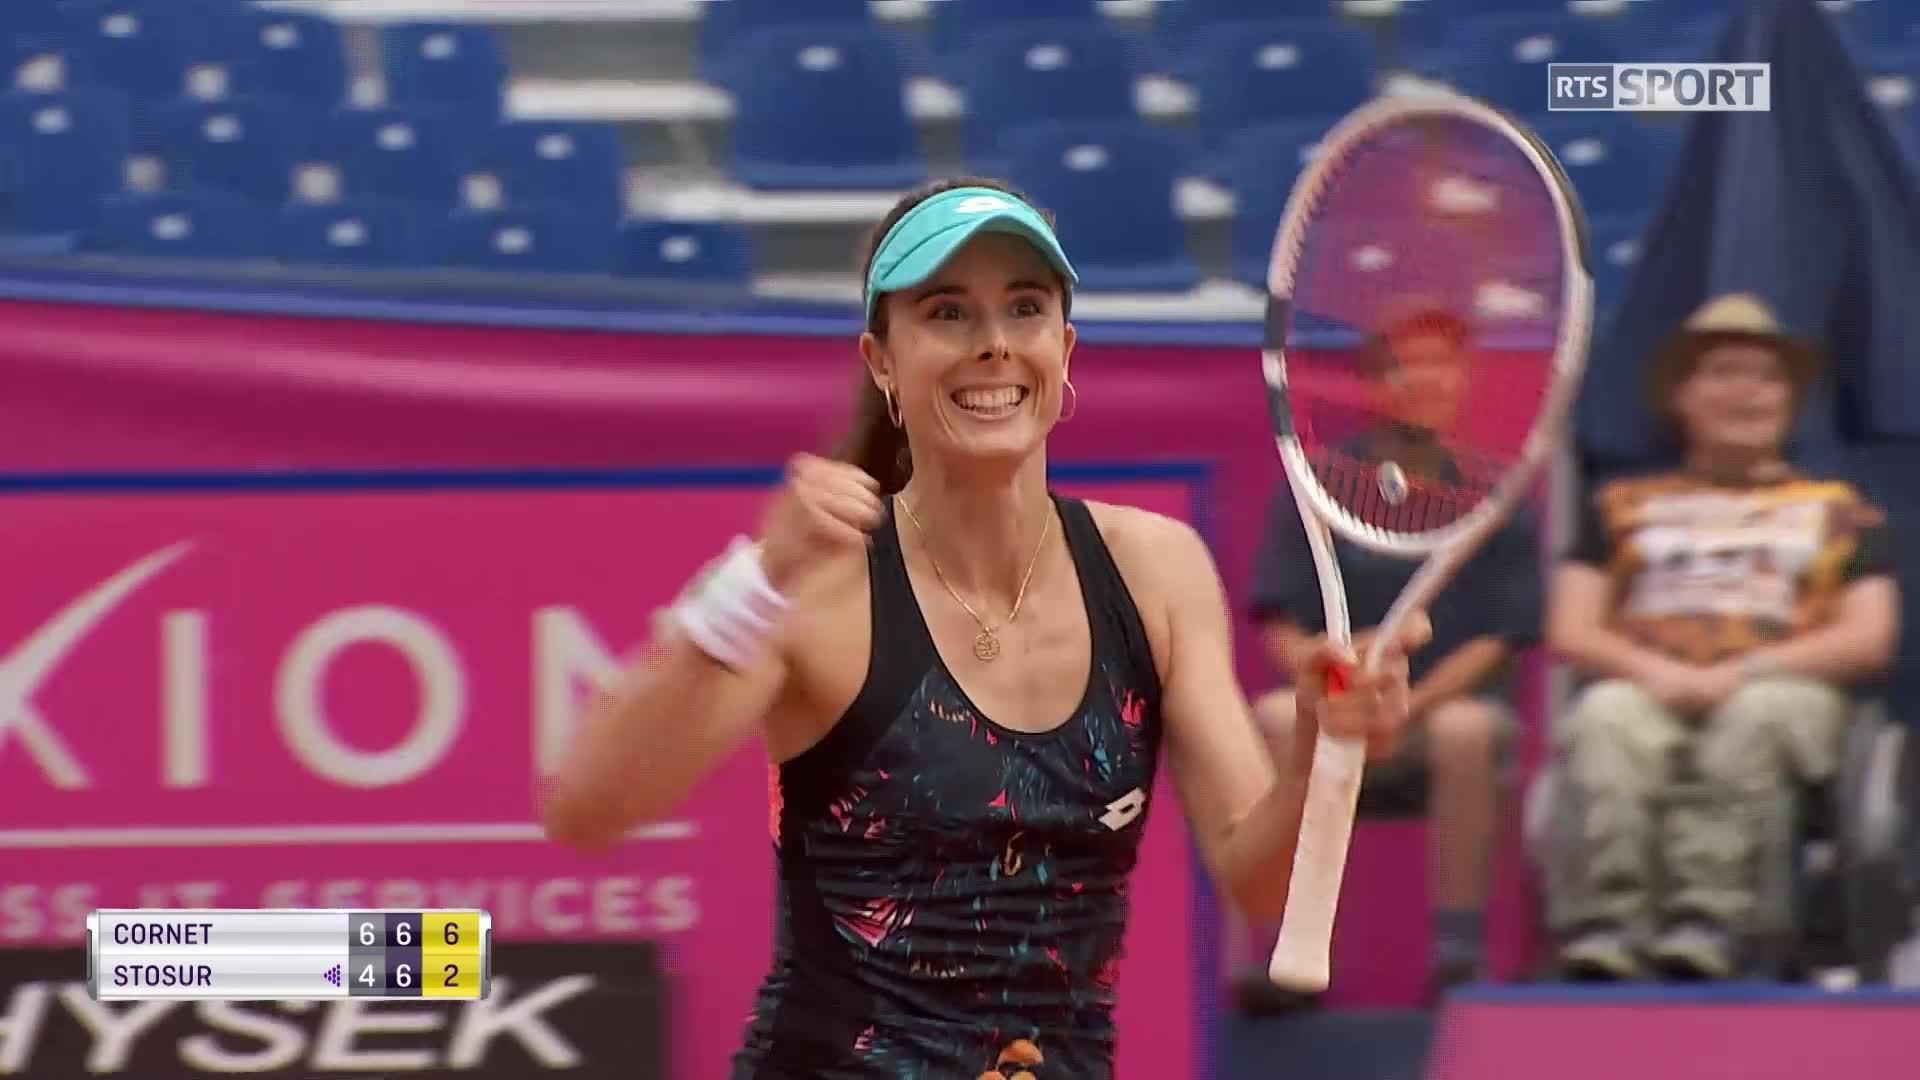 WTA - Gstaad : Cornet en finale après l'abandon de Bouchard